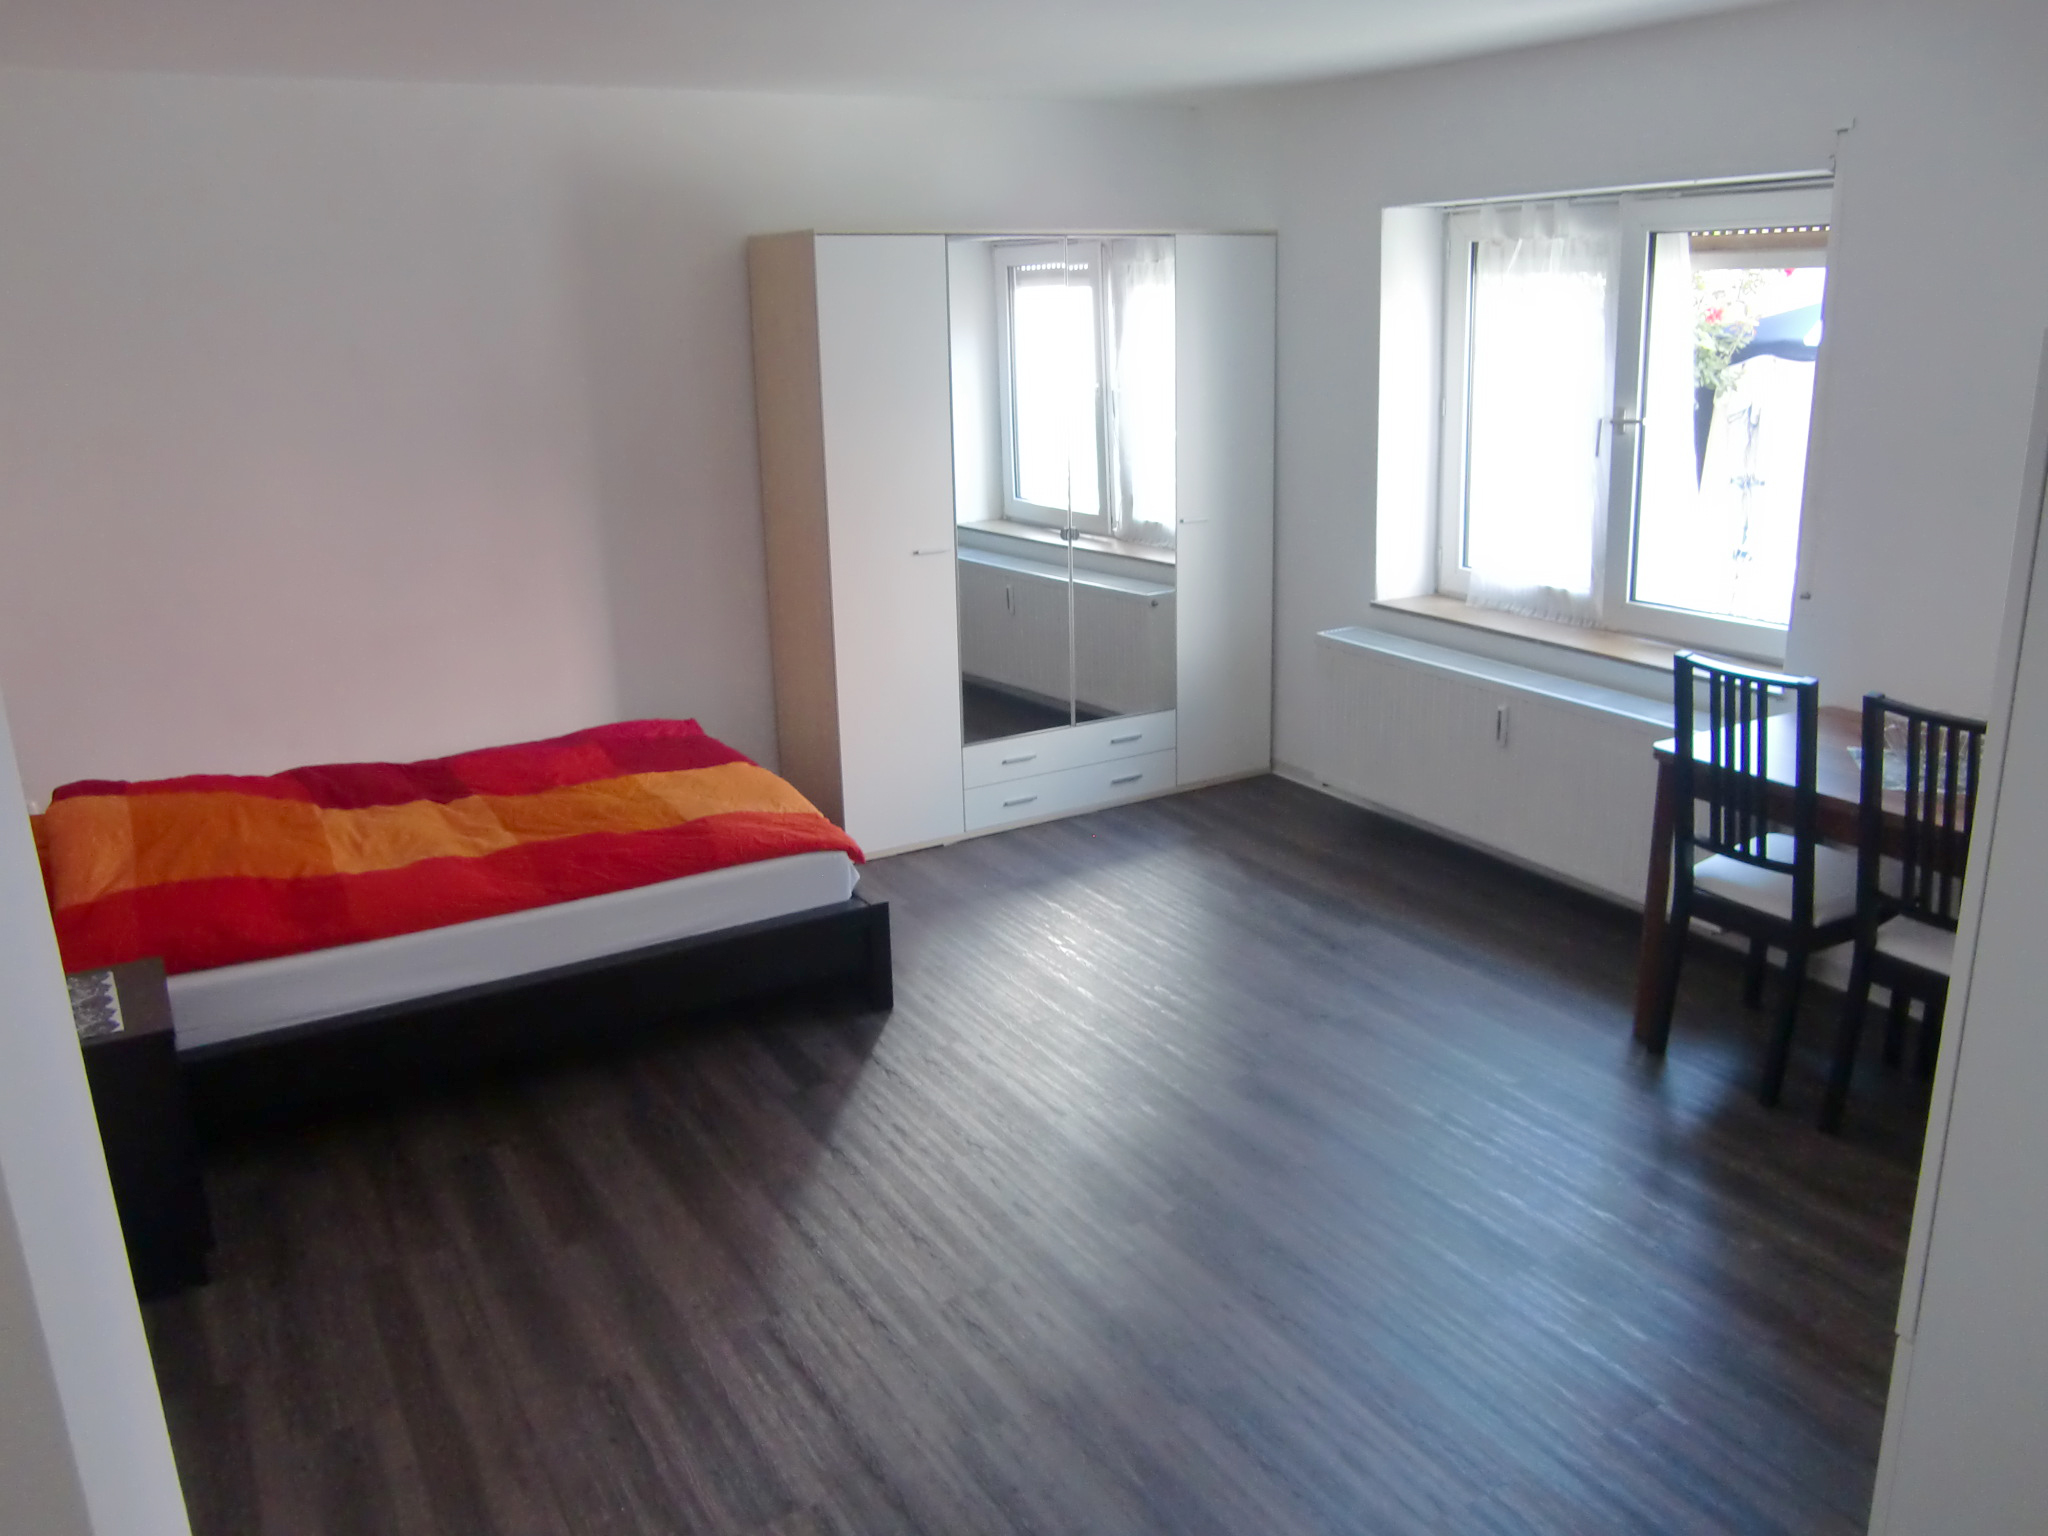 unterkunft in mannheim. Black Bedroom Furniture Sets. Home Design Ideas